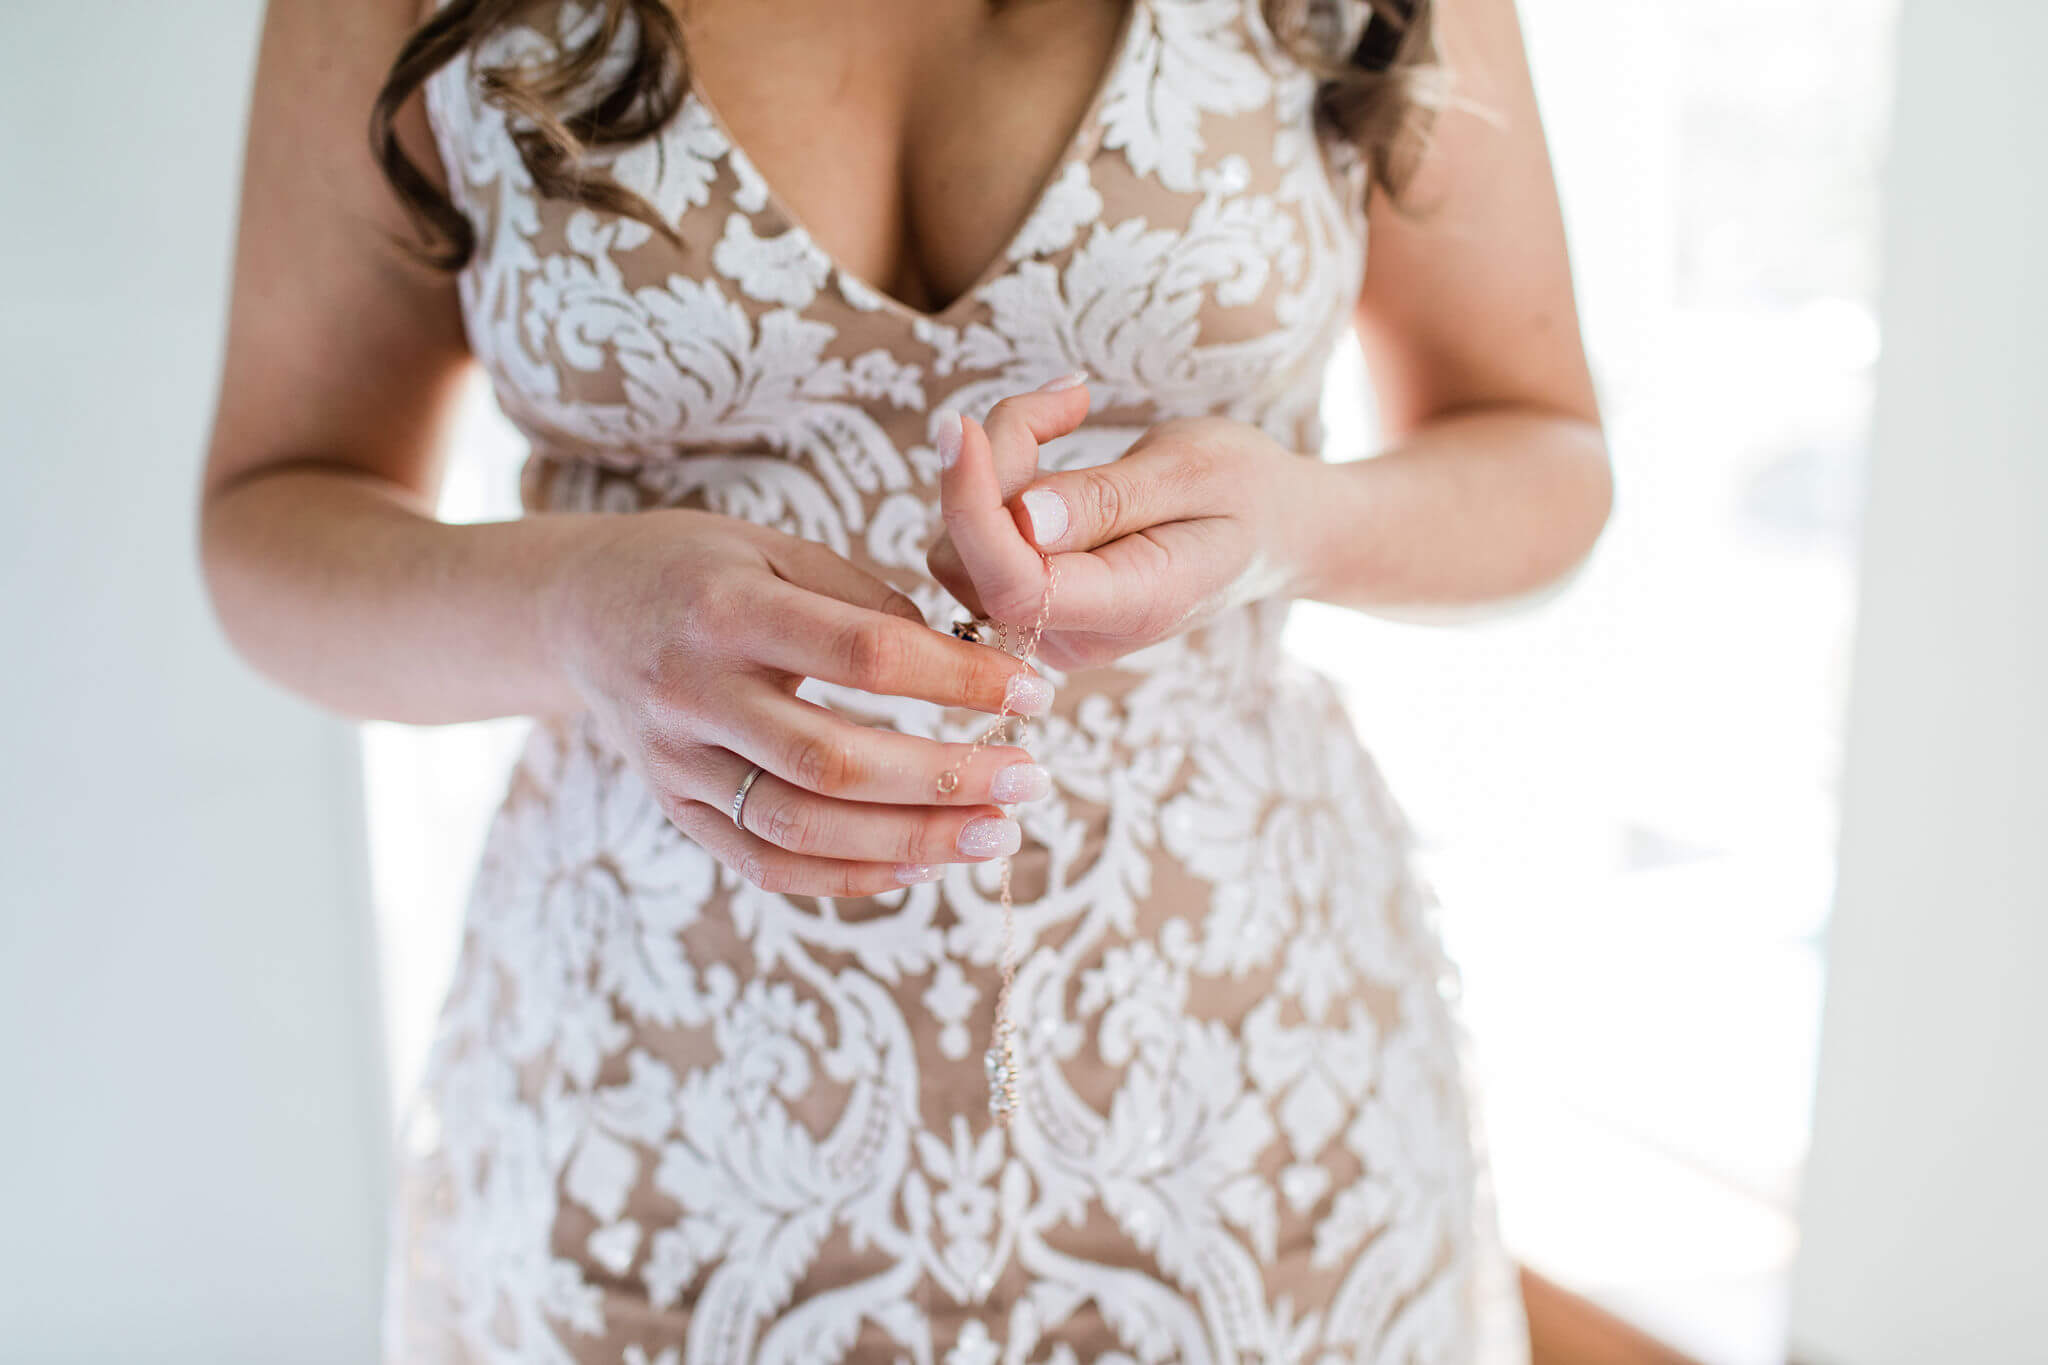 apt-b-photography-savannah-wedding-photographer-savannah-wedding-savannah-elopement-intimate-wedding-photographer-64.JPG